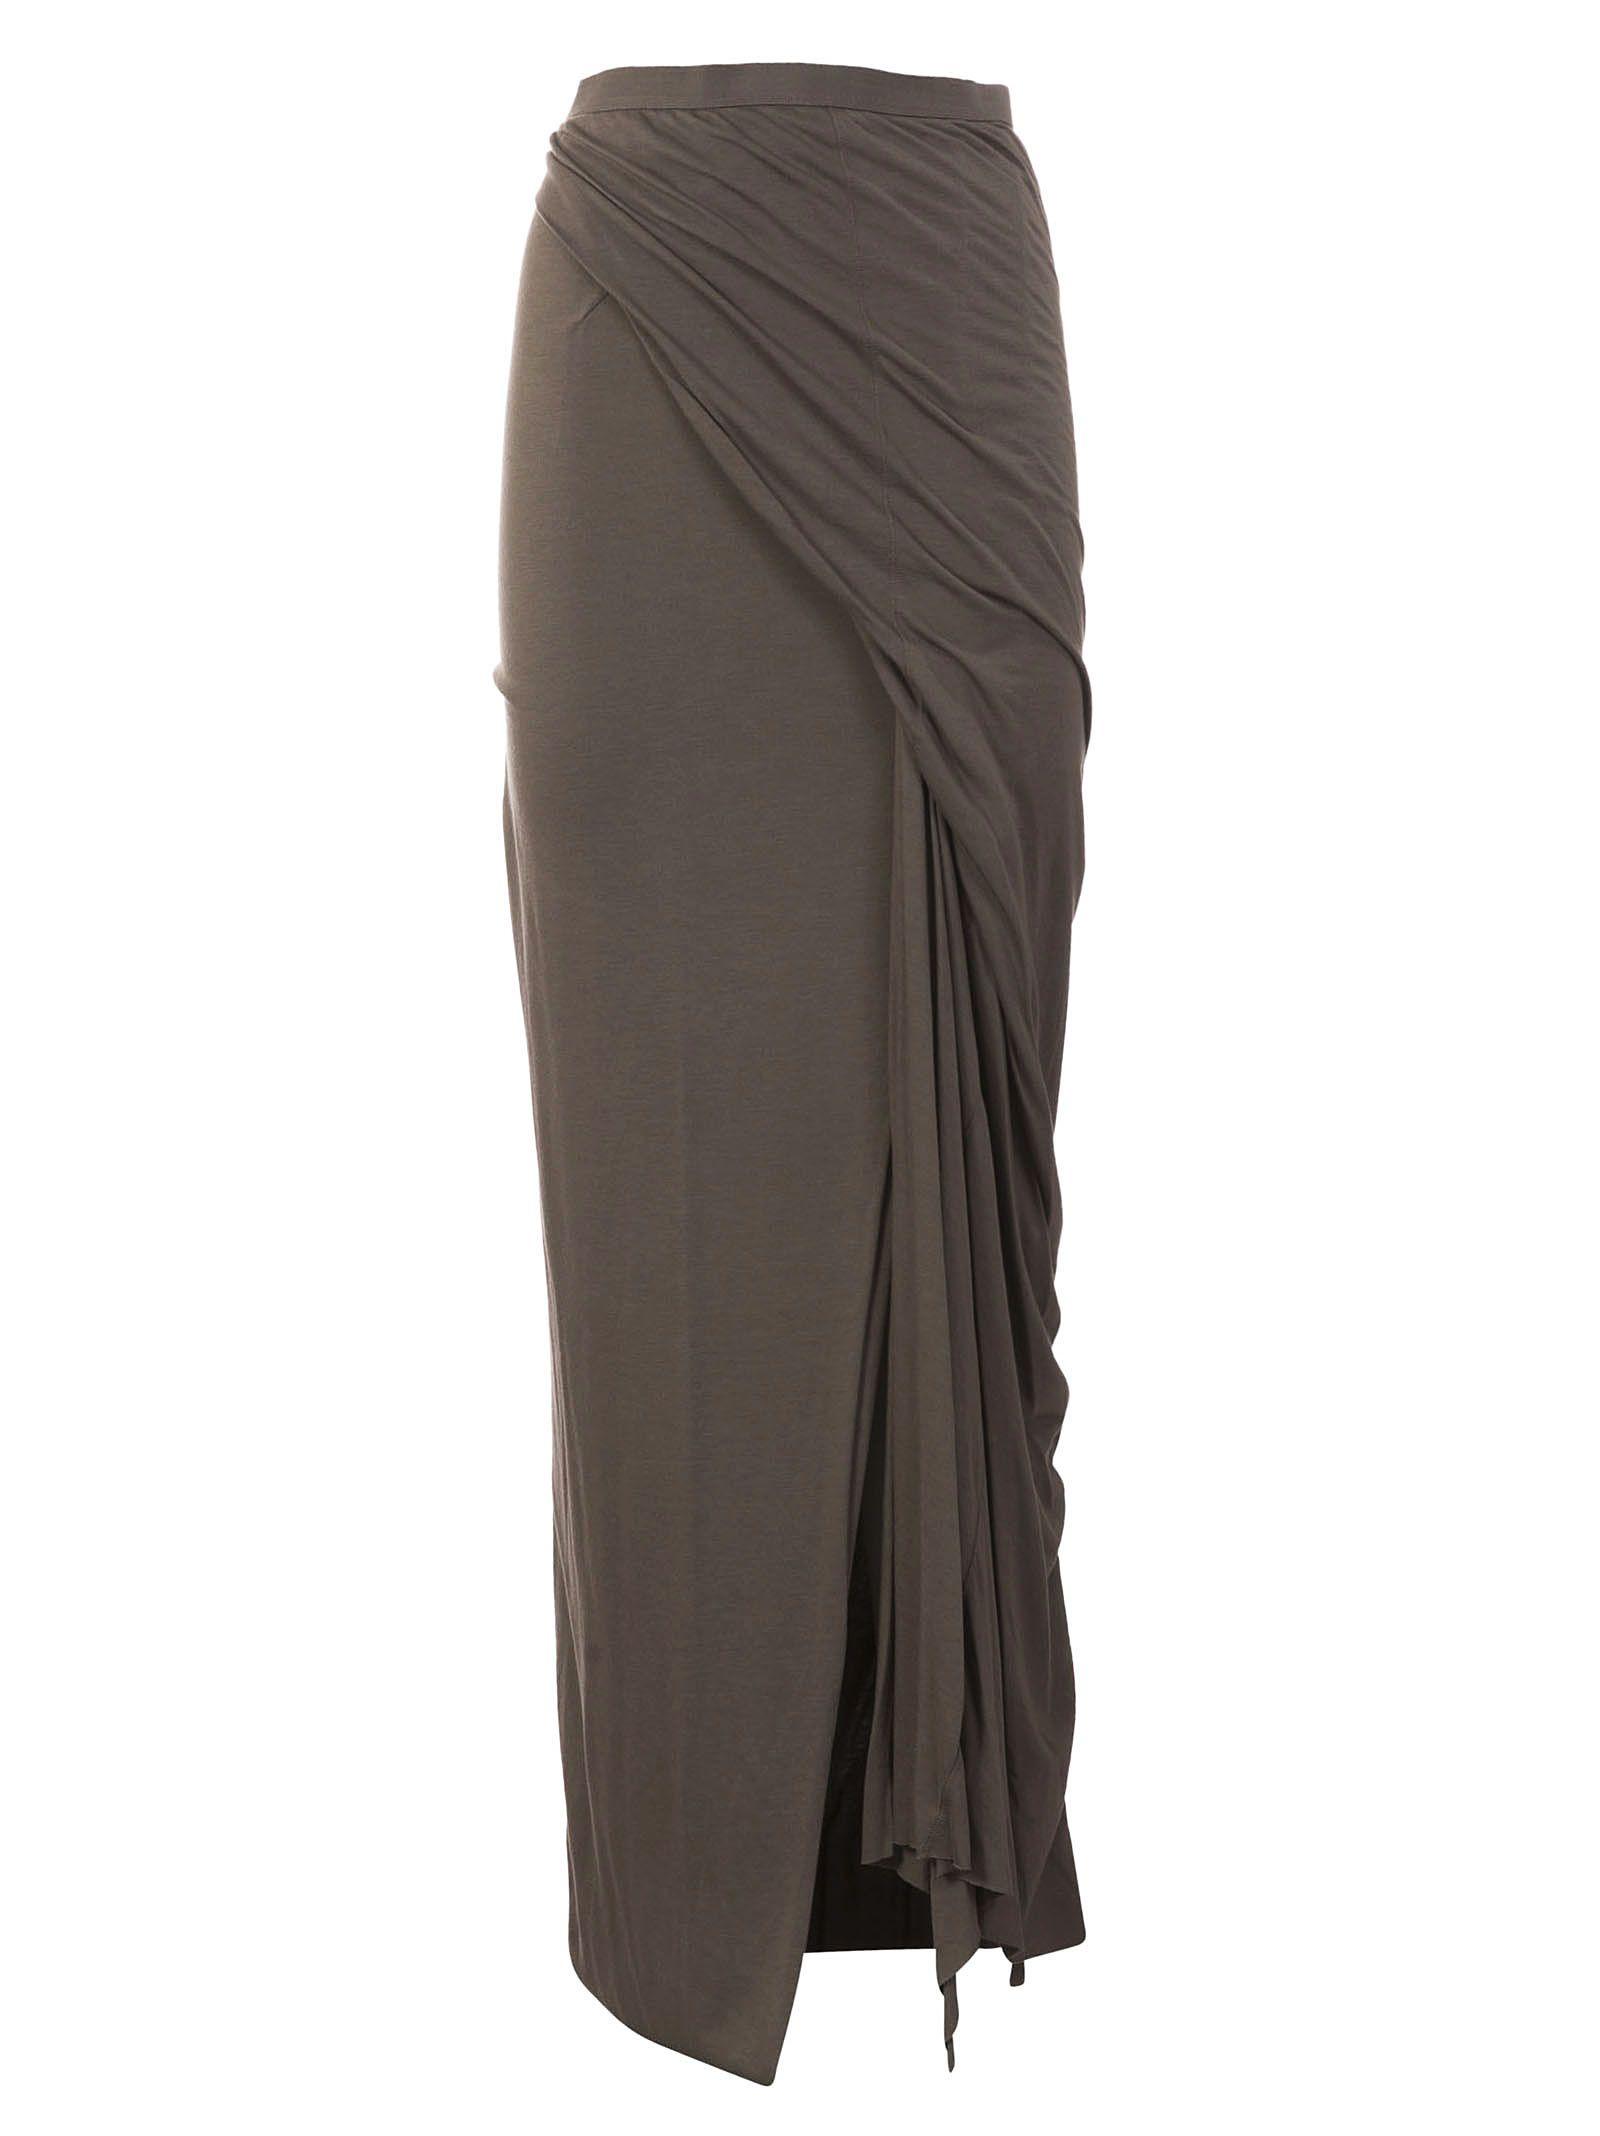 Rick Owens Lilies Side Slit Skirt